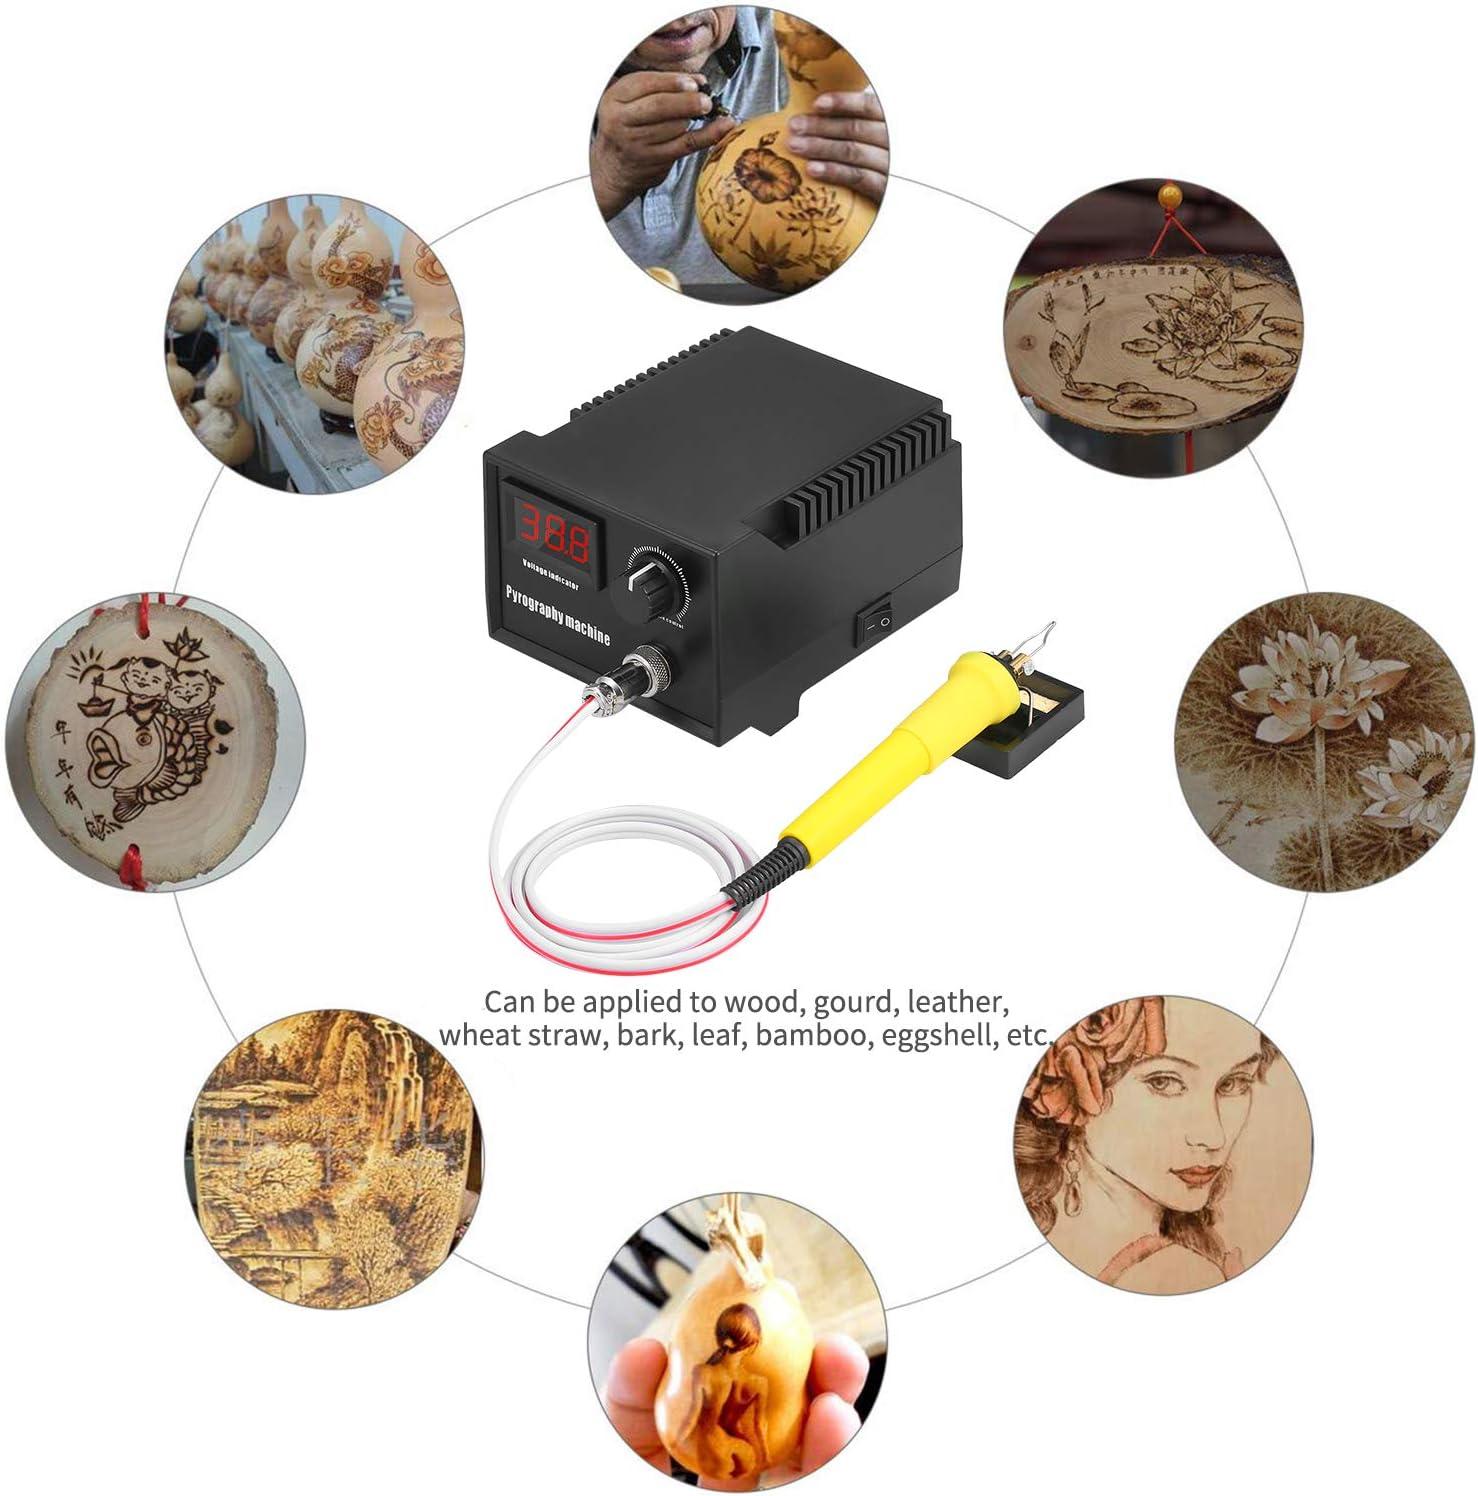 M/áquina de pirograf/ía,pirograbador de madera 60w profesional 29pcs//19pcs tipo di digitale//puntatore Ajustable 0 ℃ 800 ℃